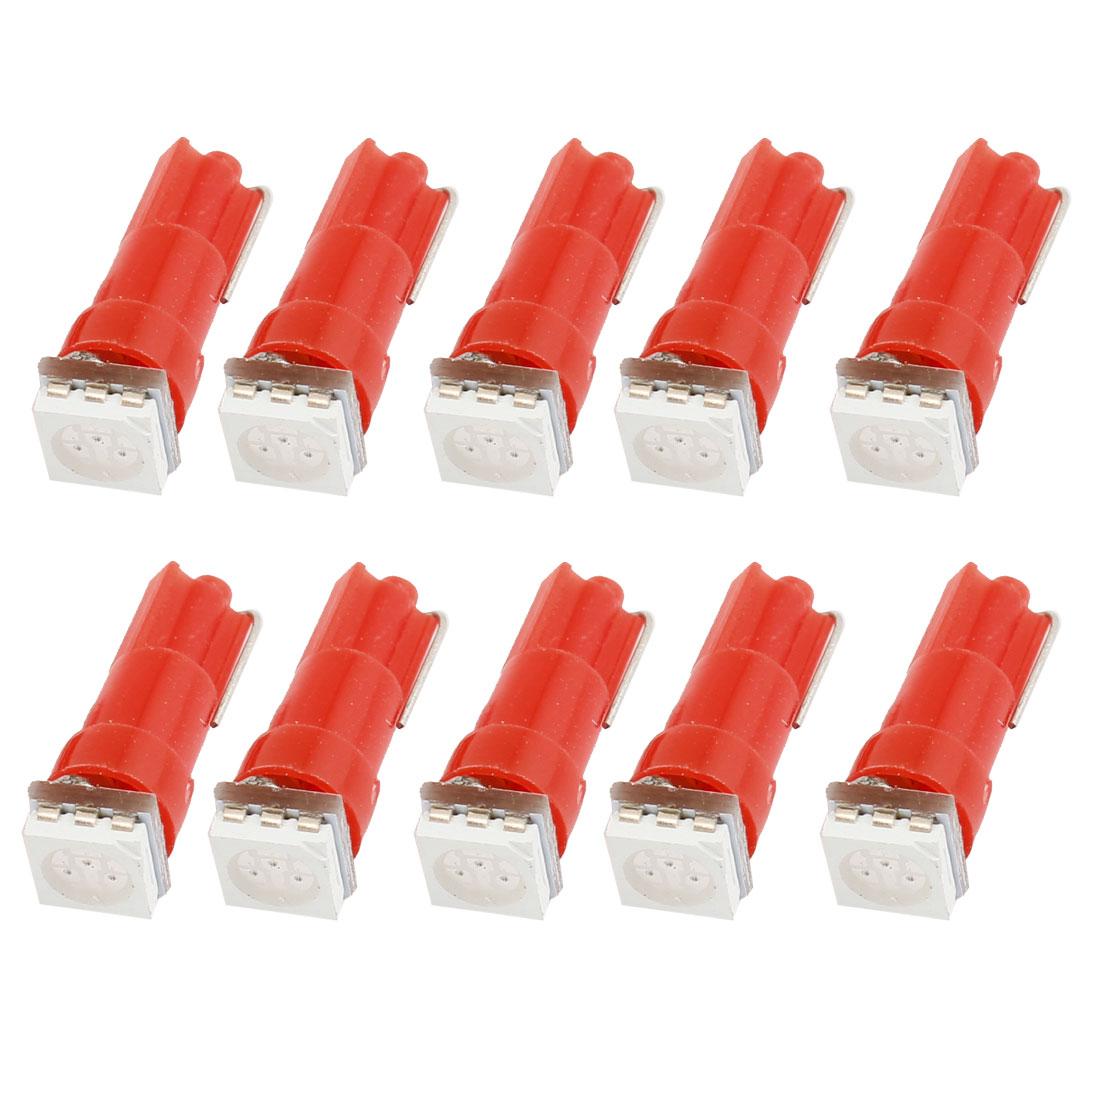 DC 12V T5 5050 Red SMD LED Car Truck Side Lights Dashboard Lamps Bulbs 10pcs